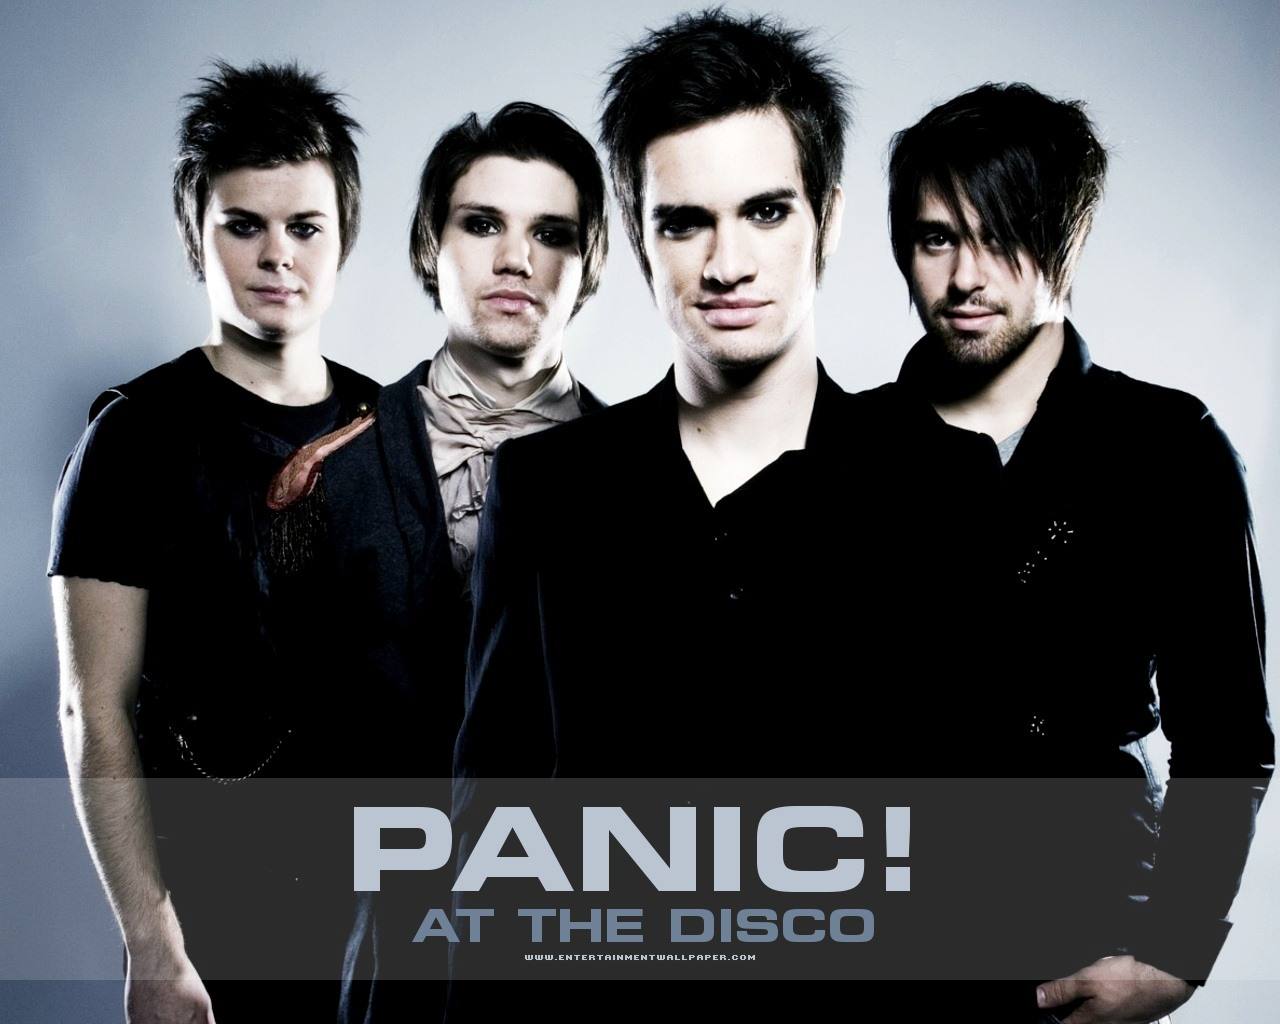 Panic ~ At the disco! Panic_at_the_disco01